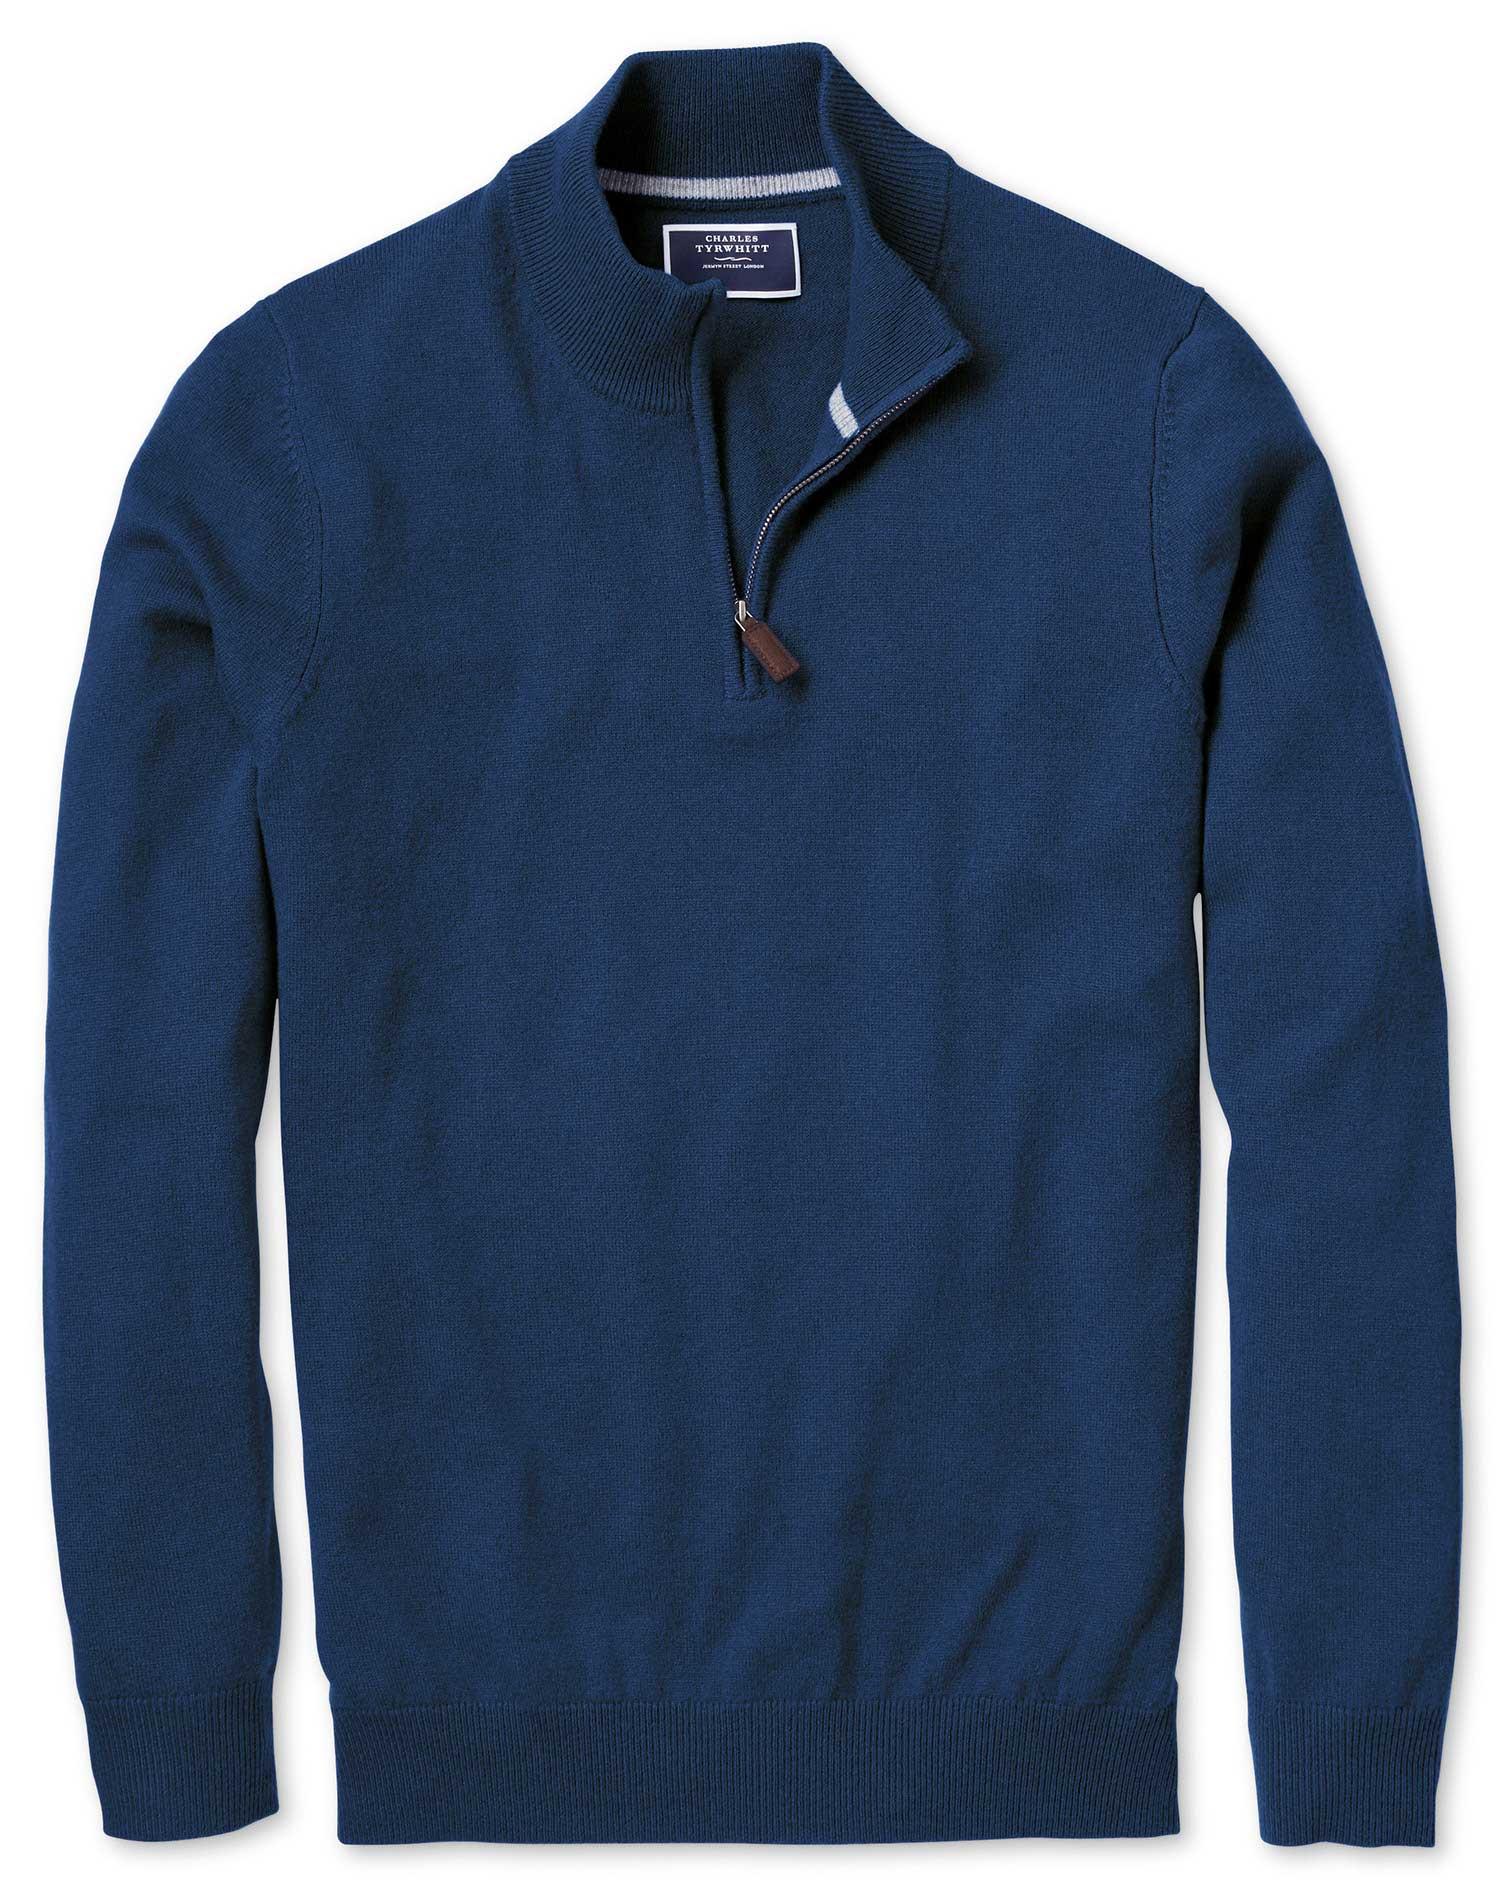 Blue Zip Neck Cashmere Sweater Size XL by Charles Tyrwhitt